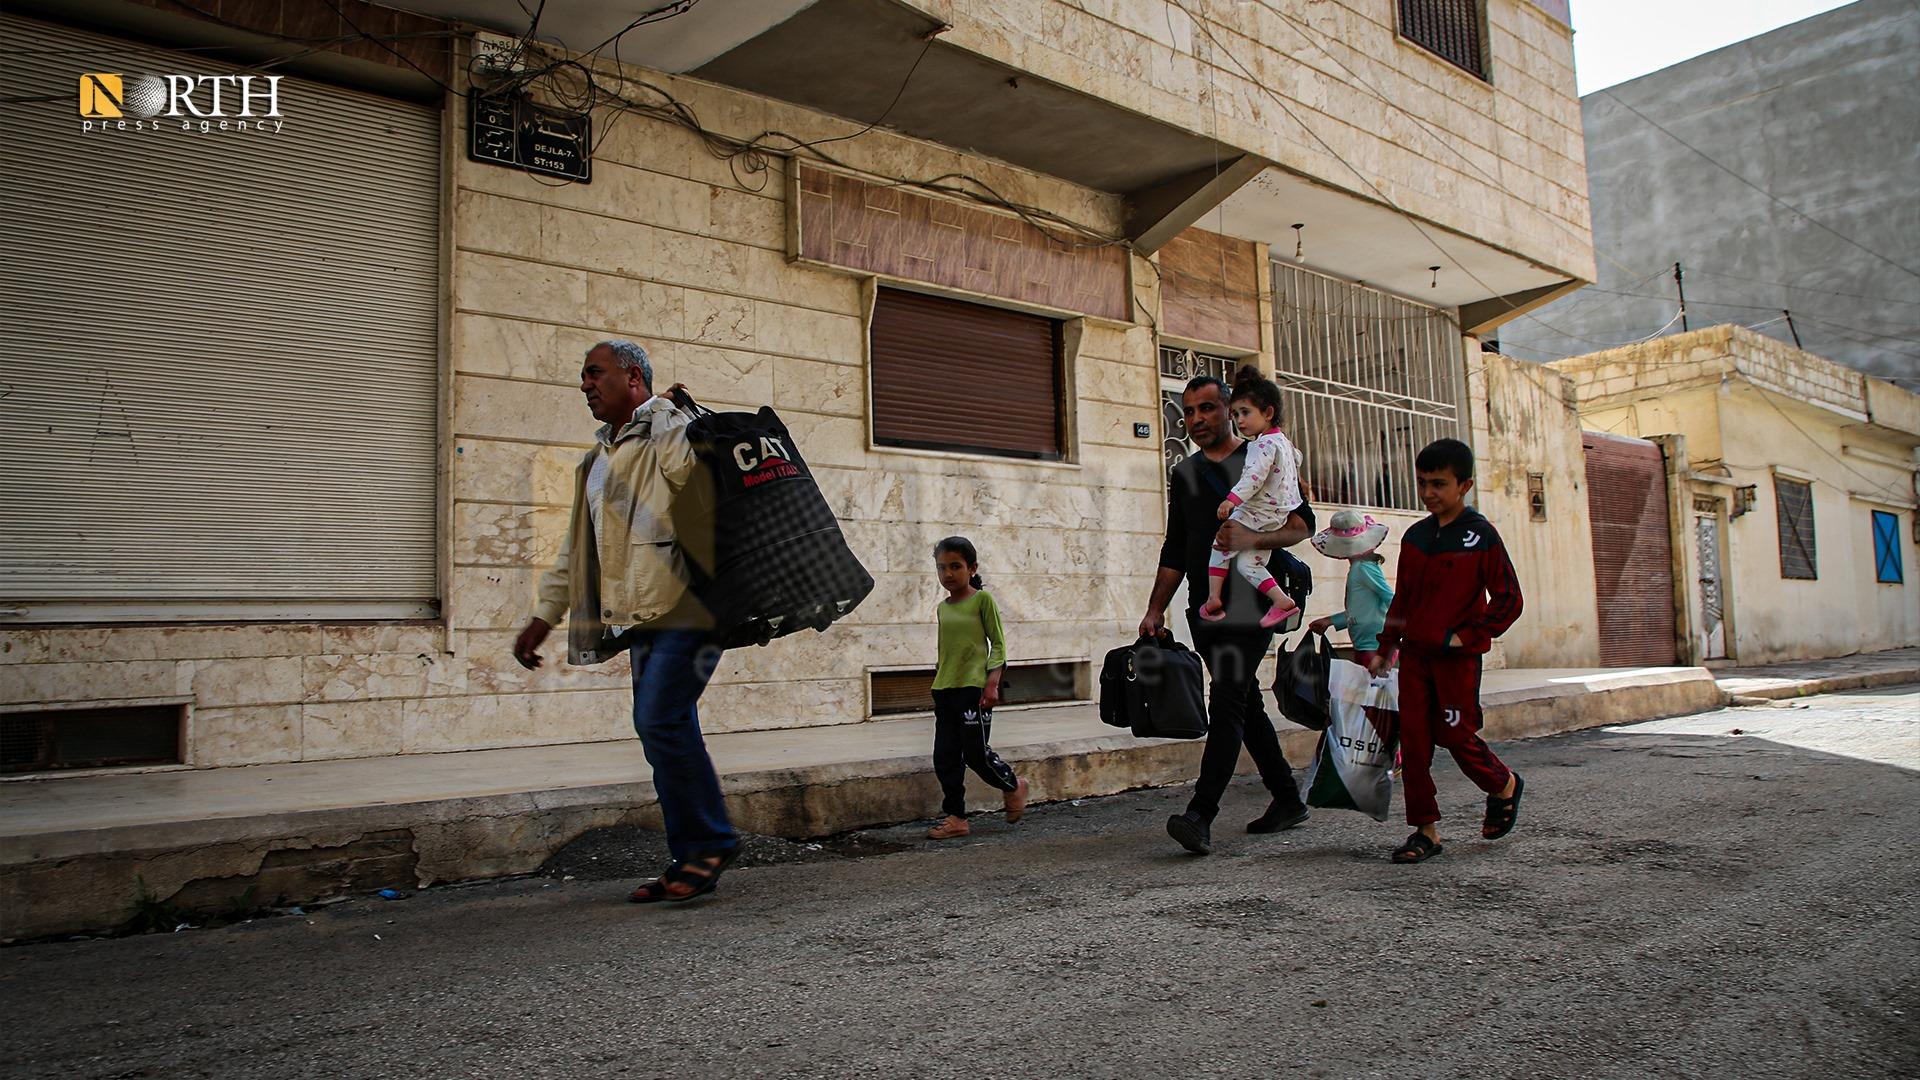 Civilians leaving al-Tai neighborhood towards Asayish-controlled areas in Qamishli – North Press